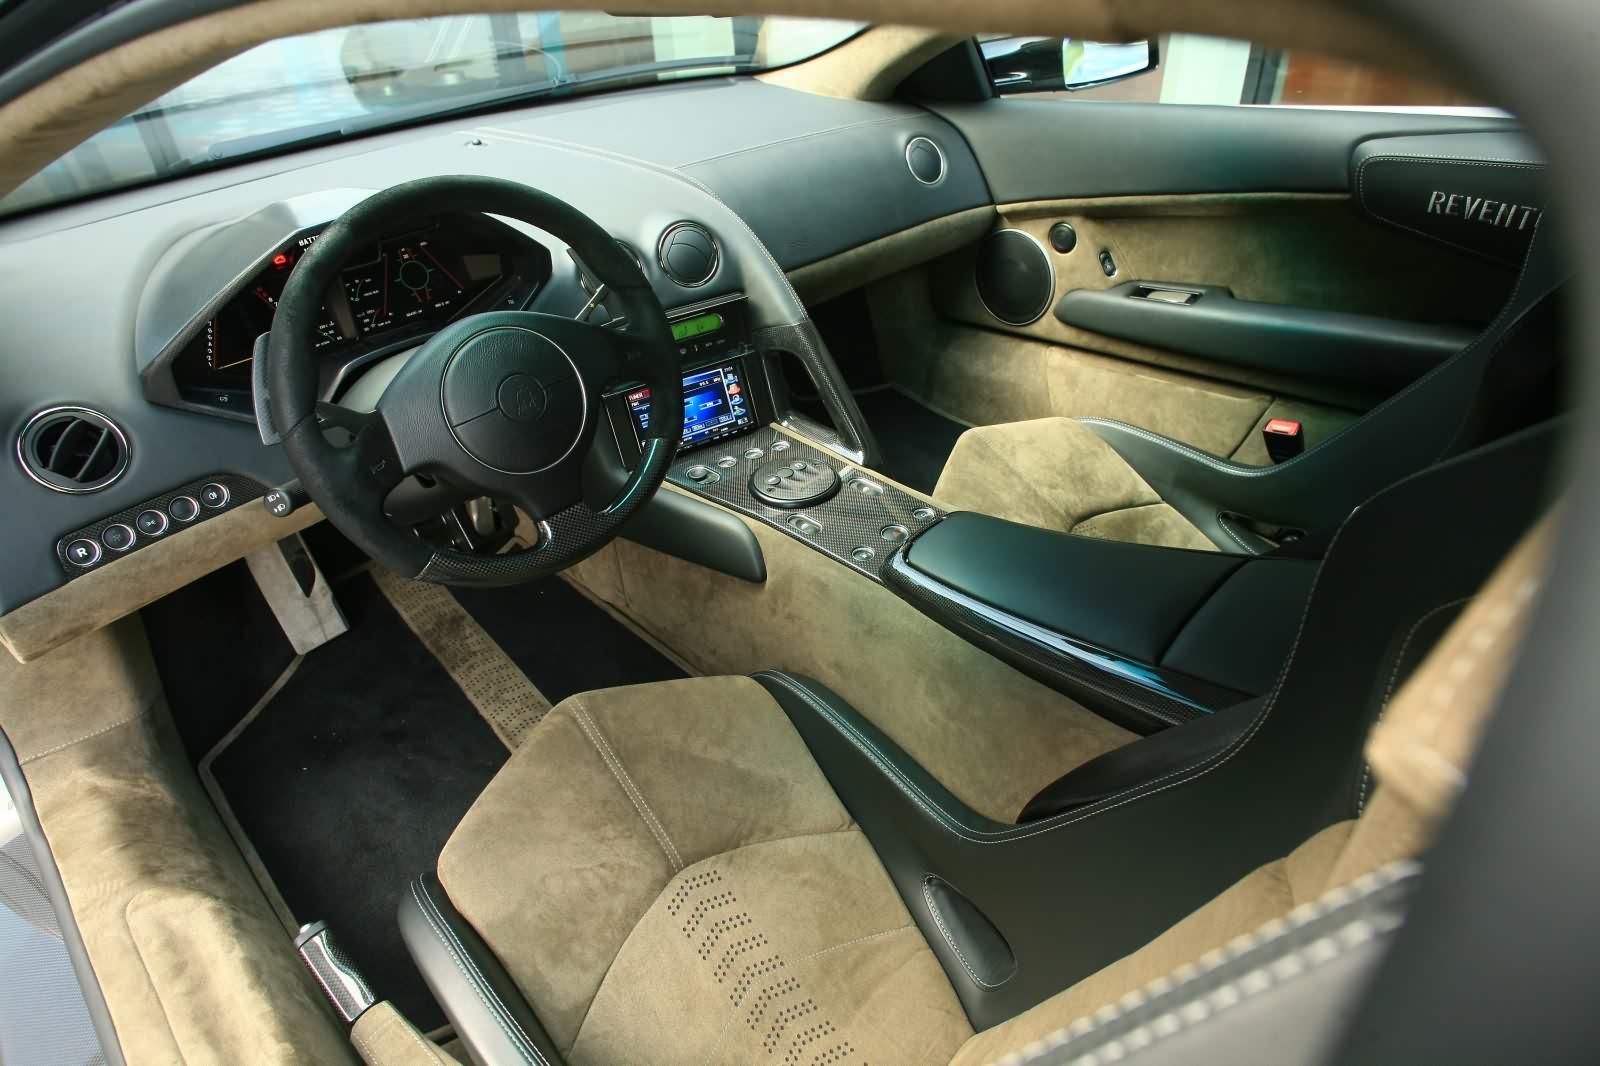 Ausfuhrliche Modellbeschreibung Uber Den Lamborghini Reventon